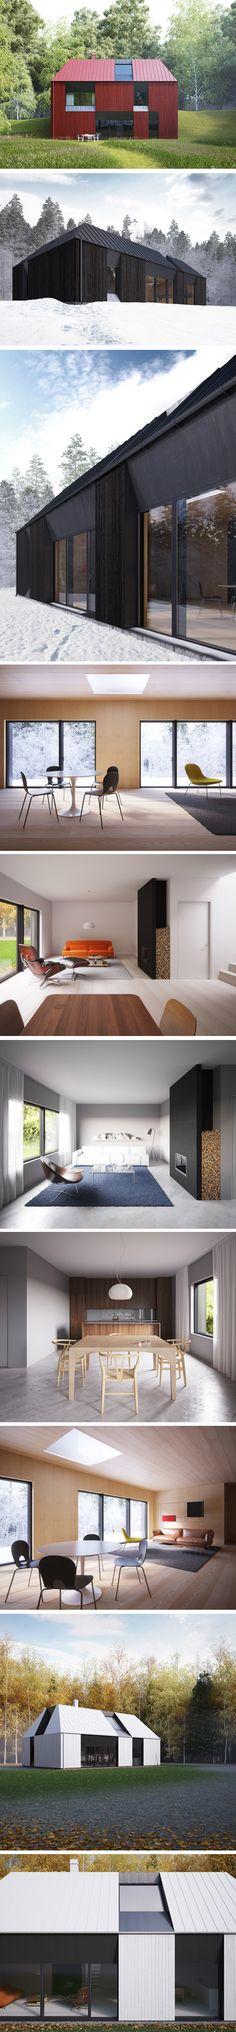 Tind-House-Claesson Koivisto-Rune-2-